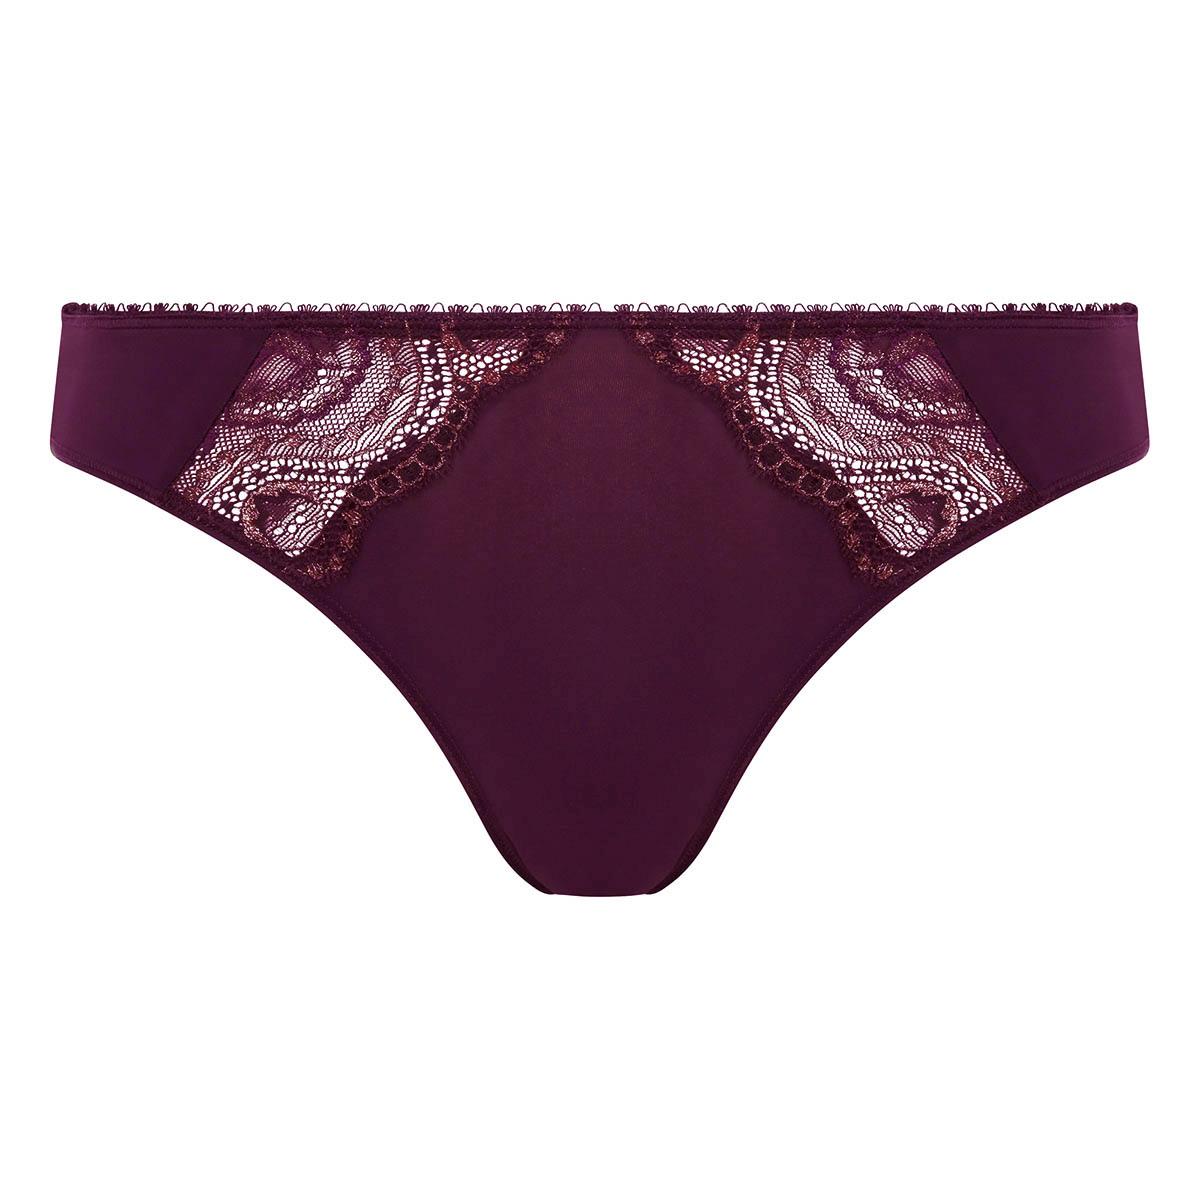 Bikini Knickers in Dark Berry Lurex Flower Elegance, , PLAYTEX